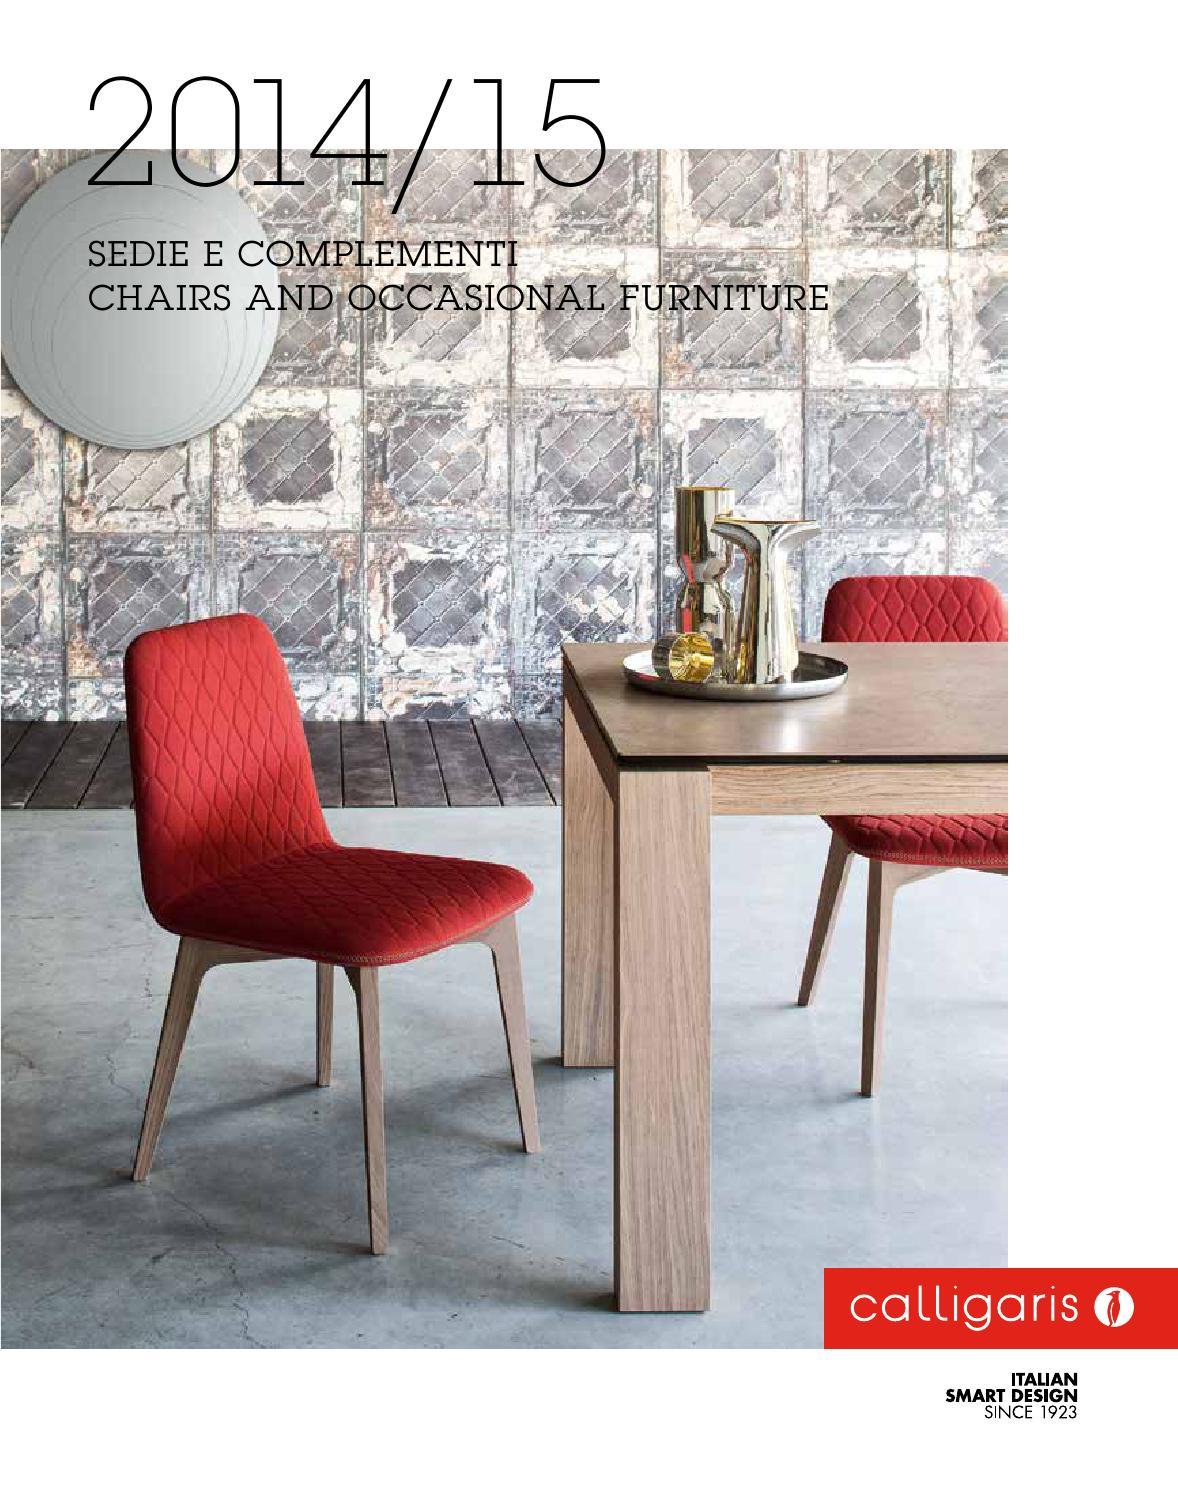 Calligaris catalogo 2014 fm sedie complementi by bassini arredi ...